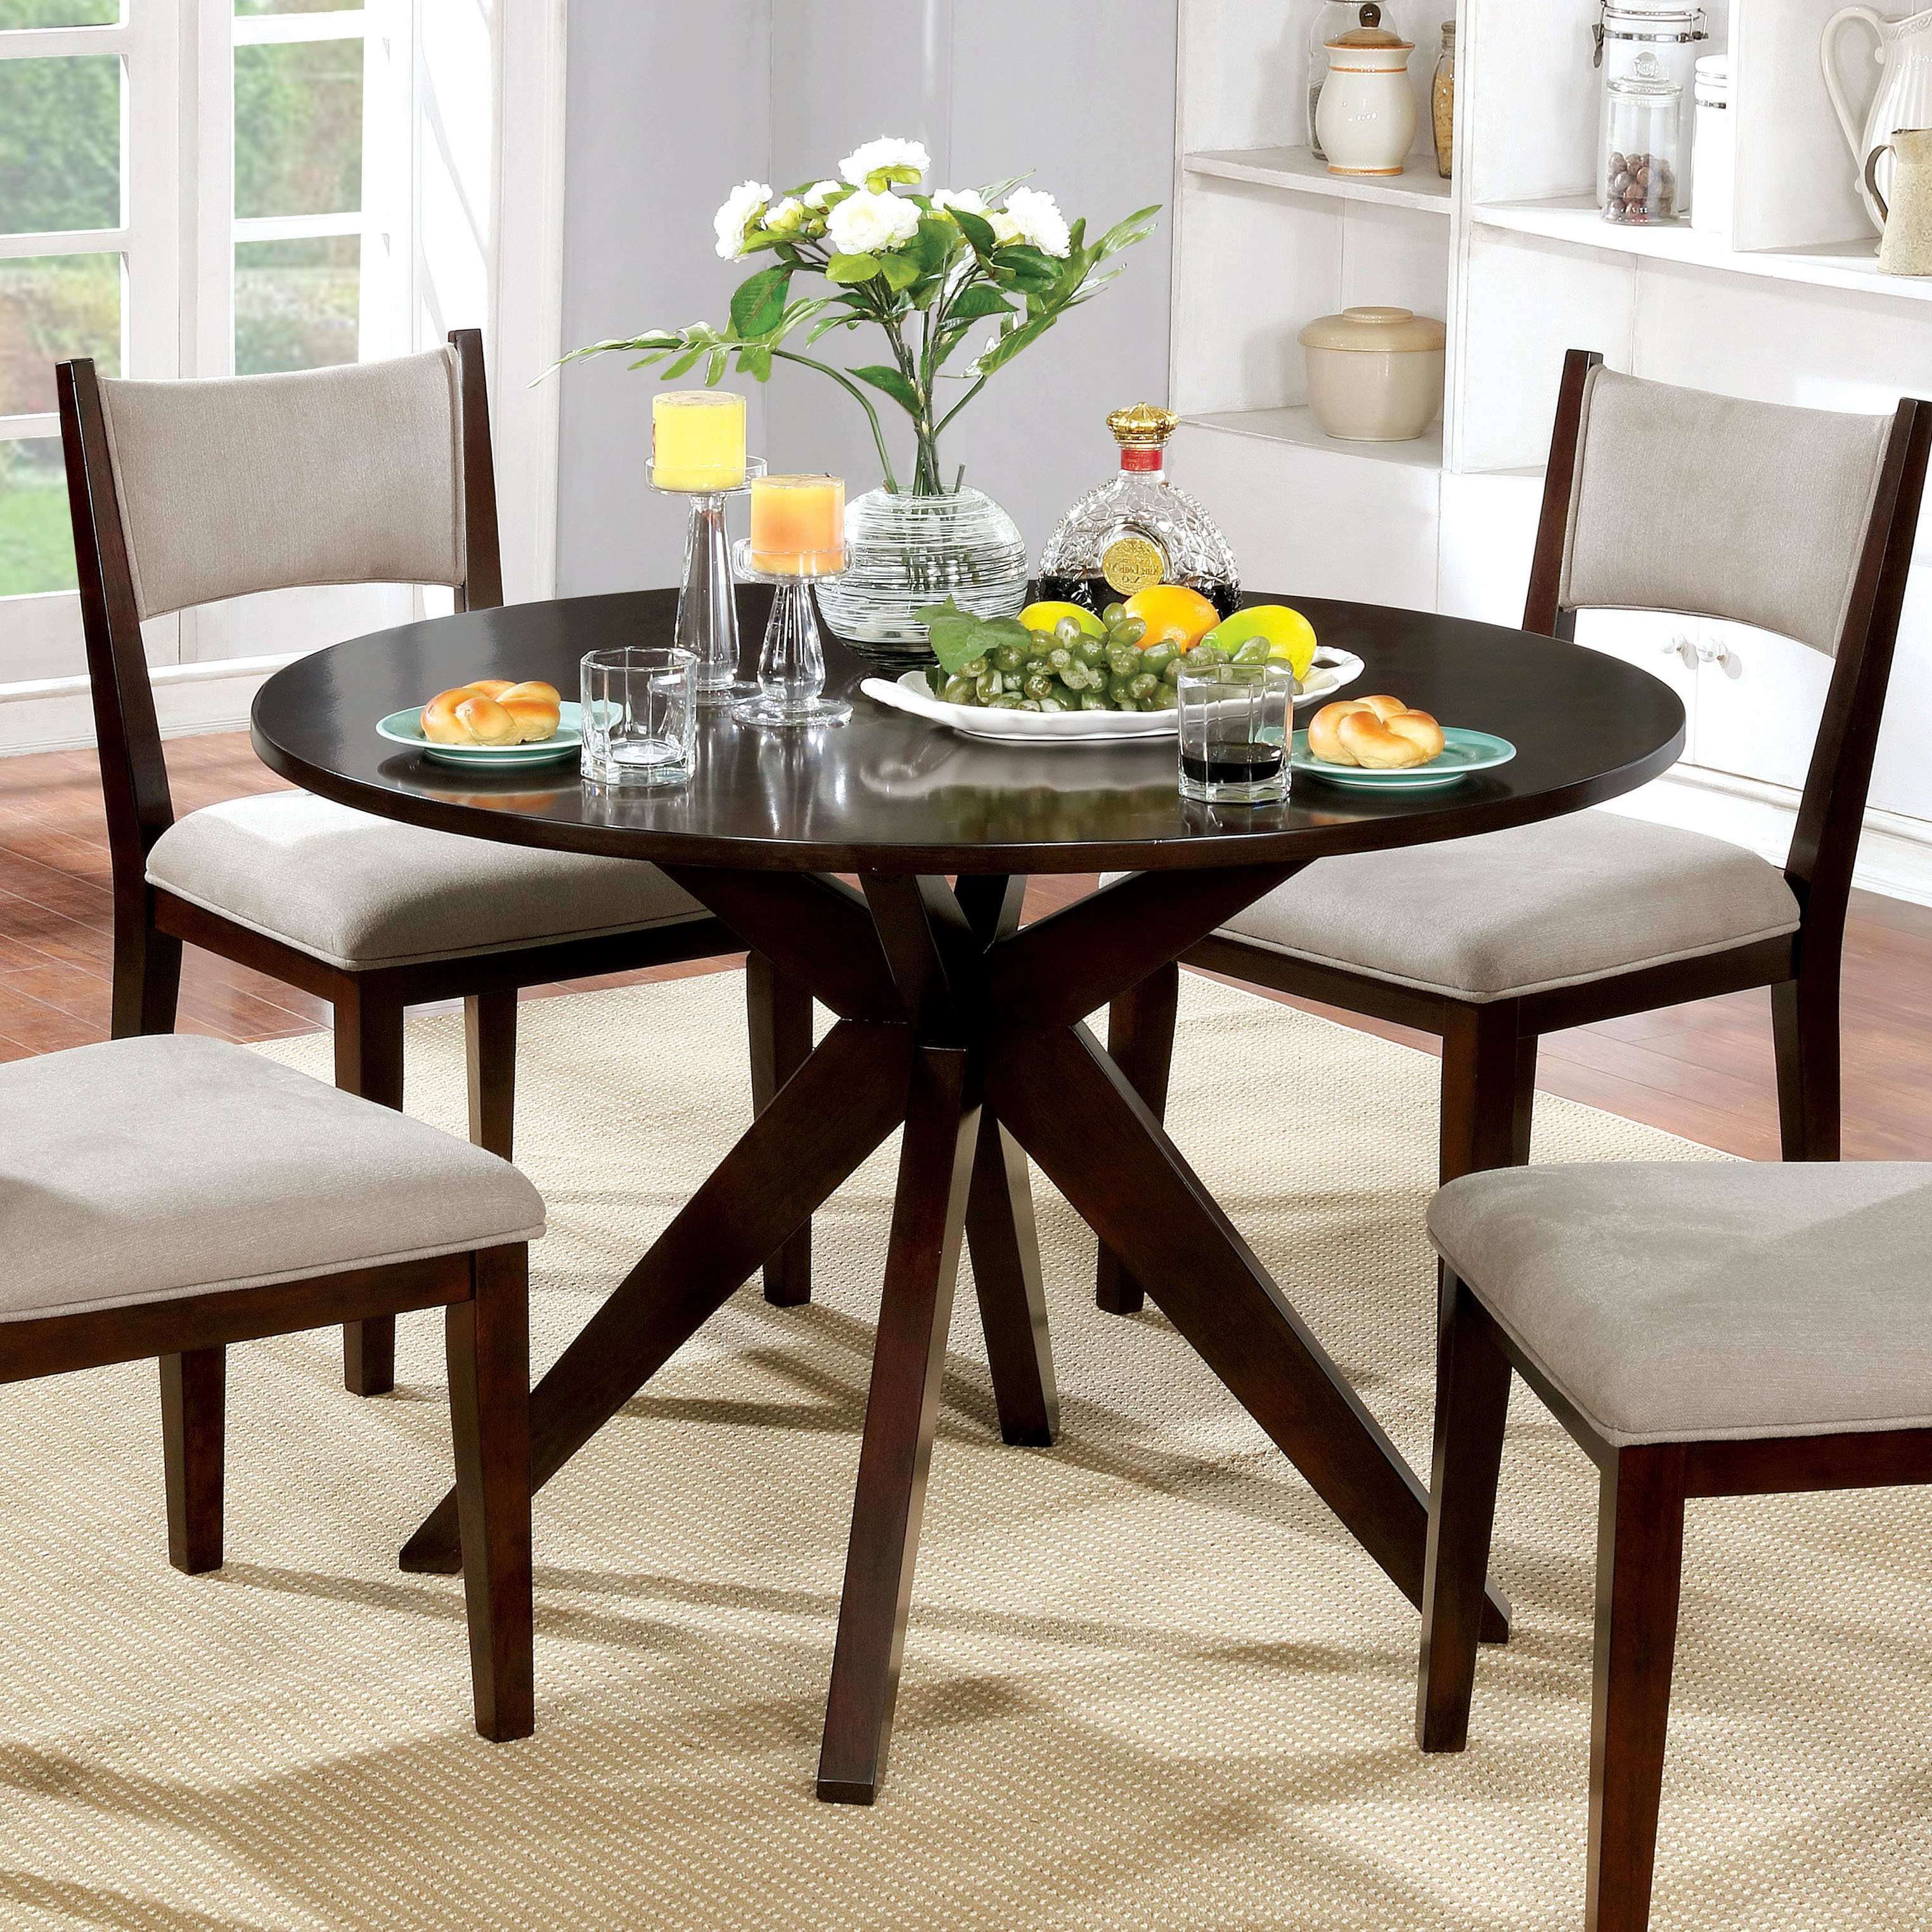 Famous Kiara Sofa Chairs Regarding Shop Furniture Of America Kiara Mid Century Modern Brown Cherry Wood (View 18 of 20)